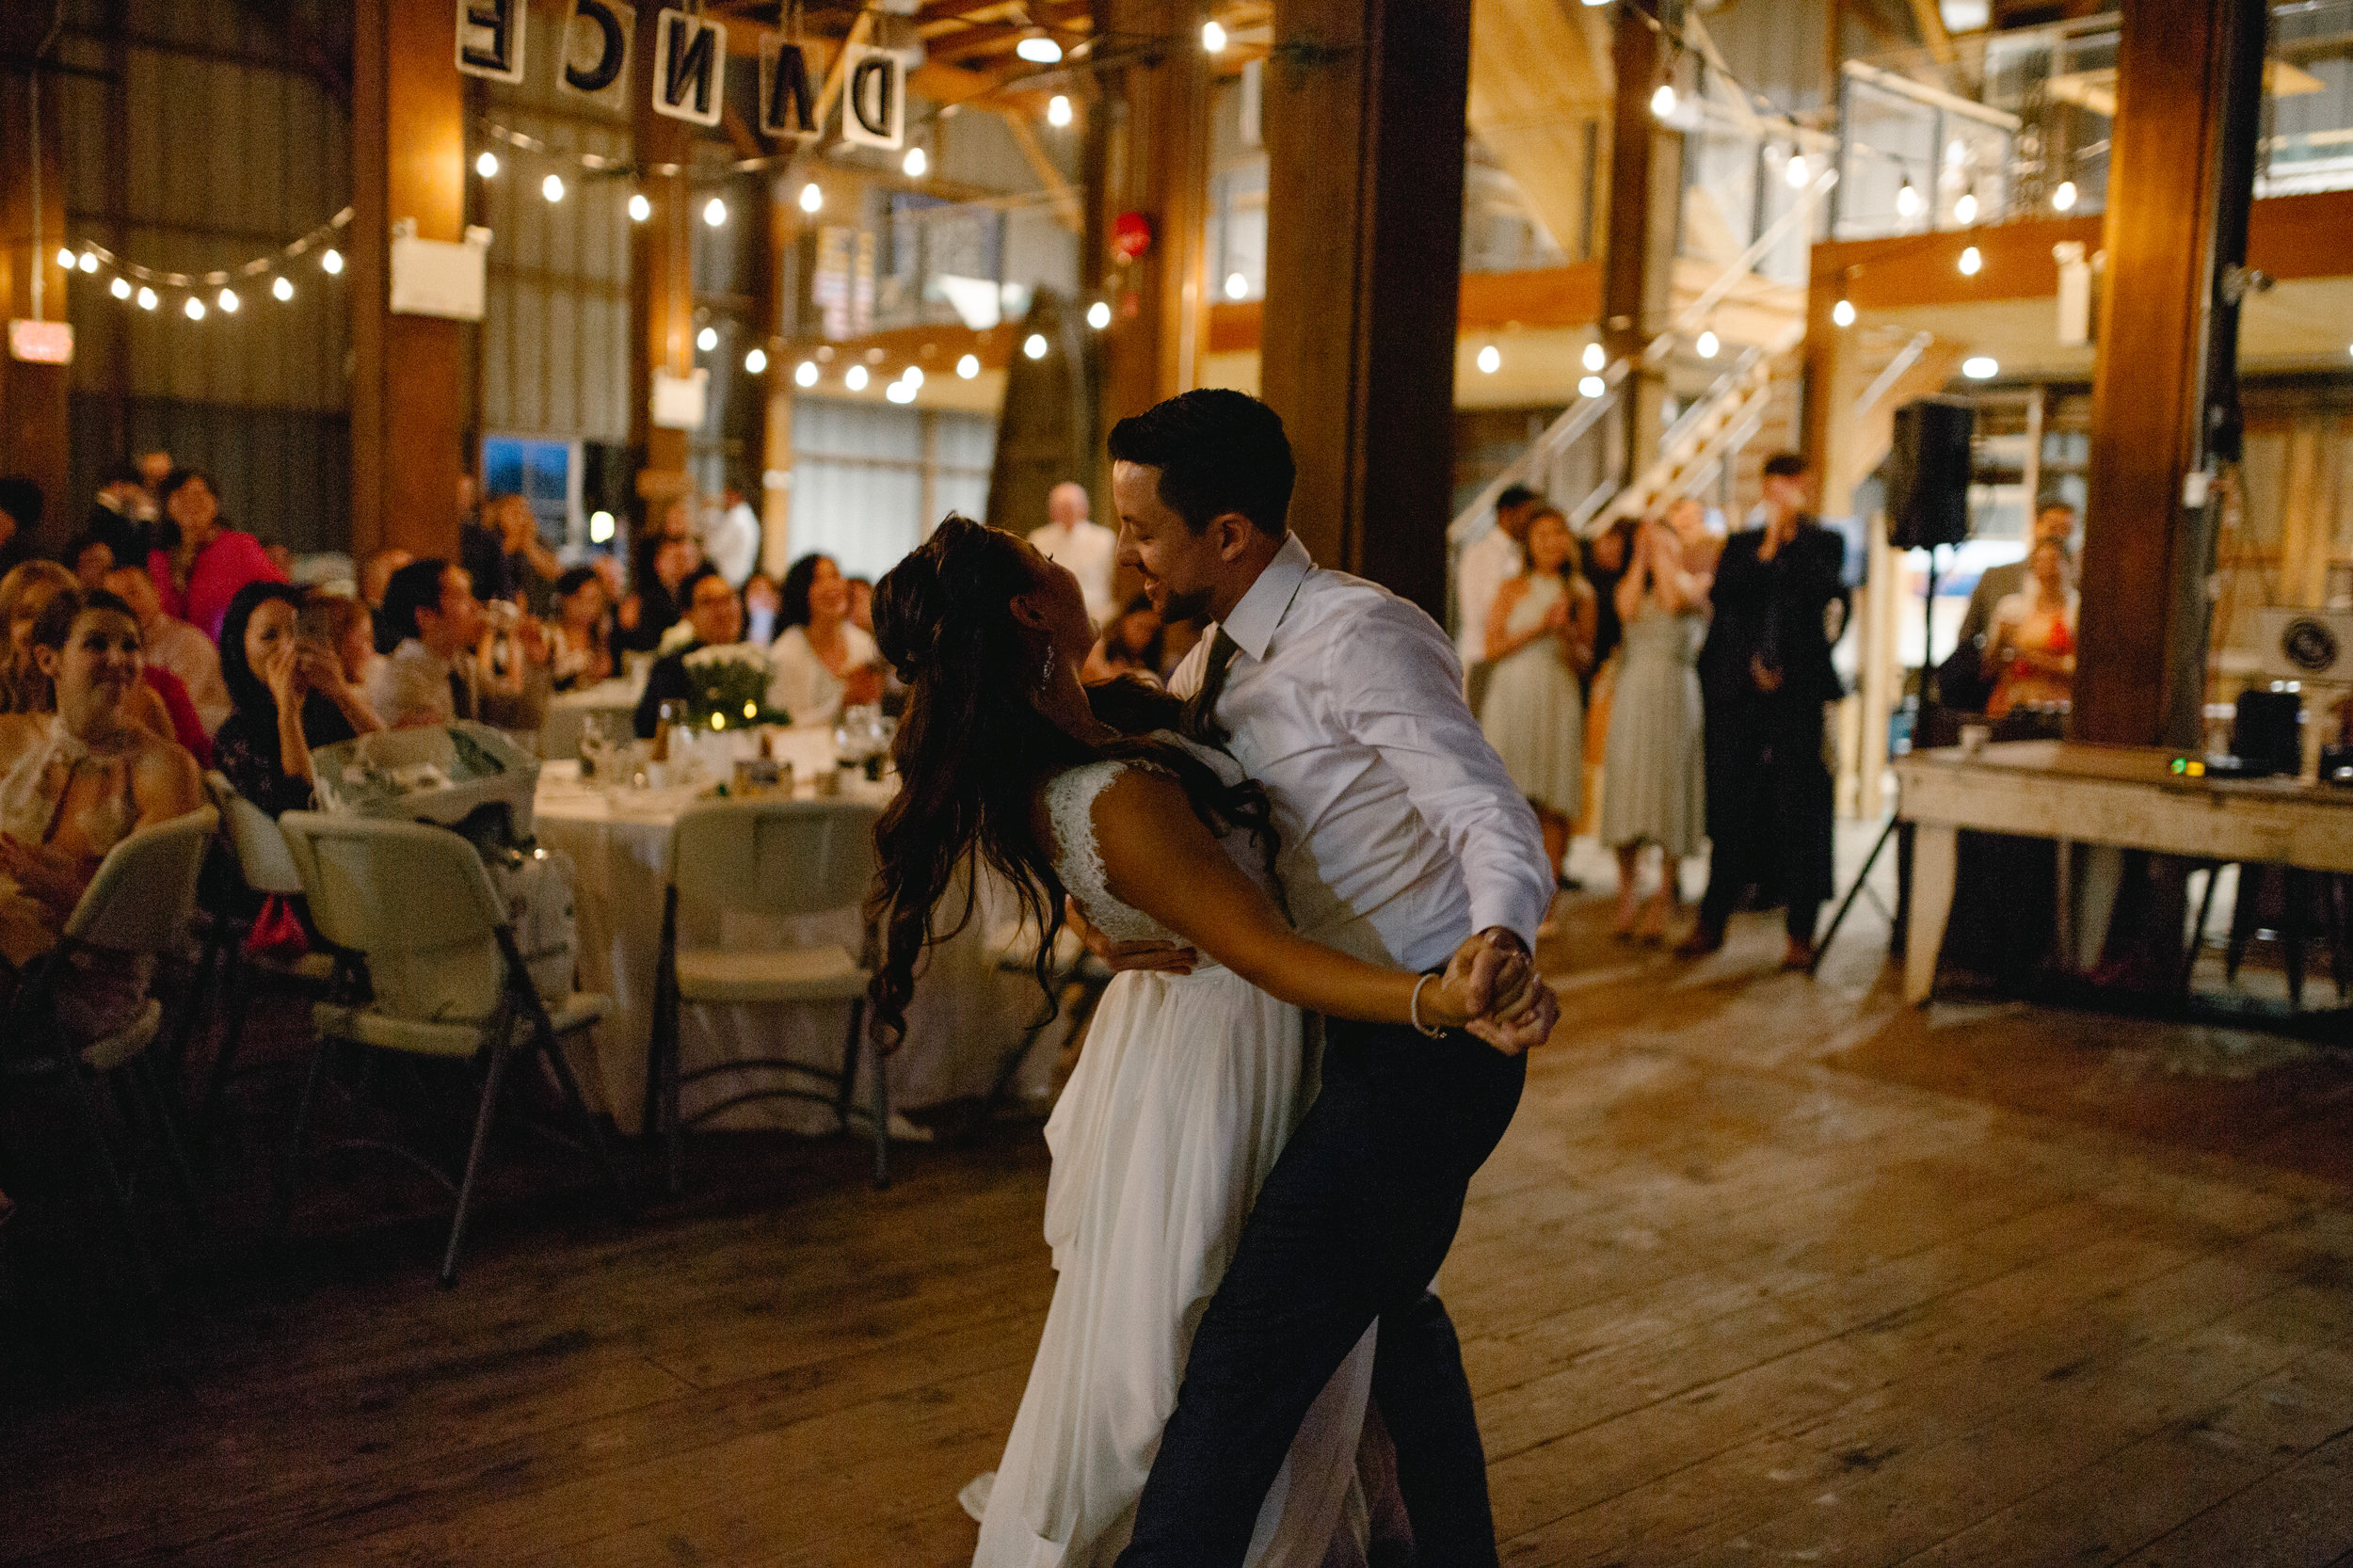 herafilms_wedding_jessica_kyle_hera_selects-52.jpg